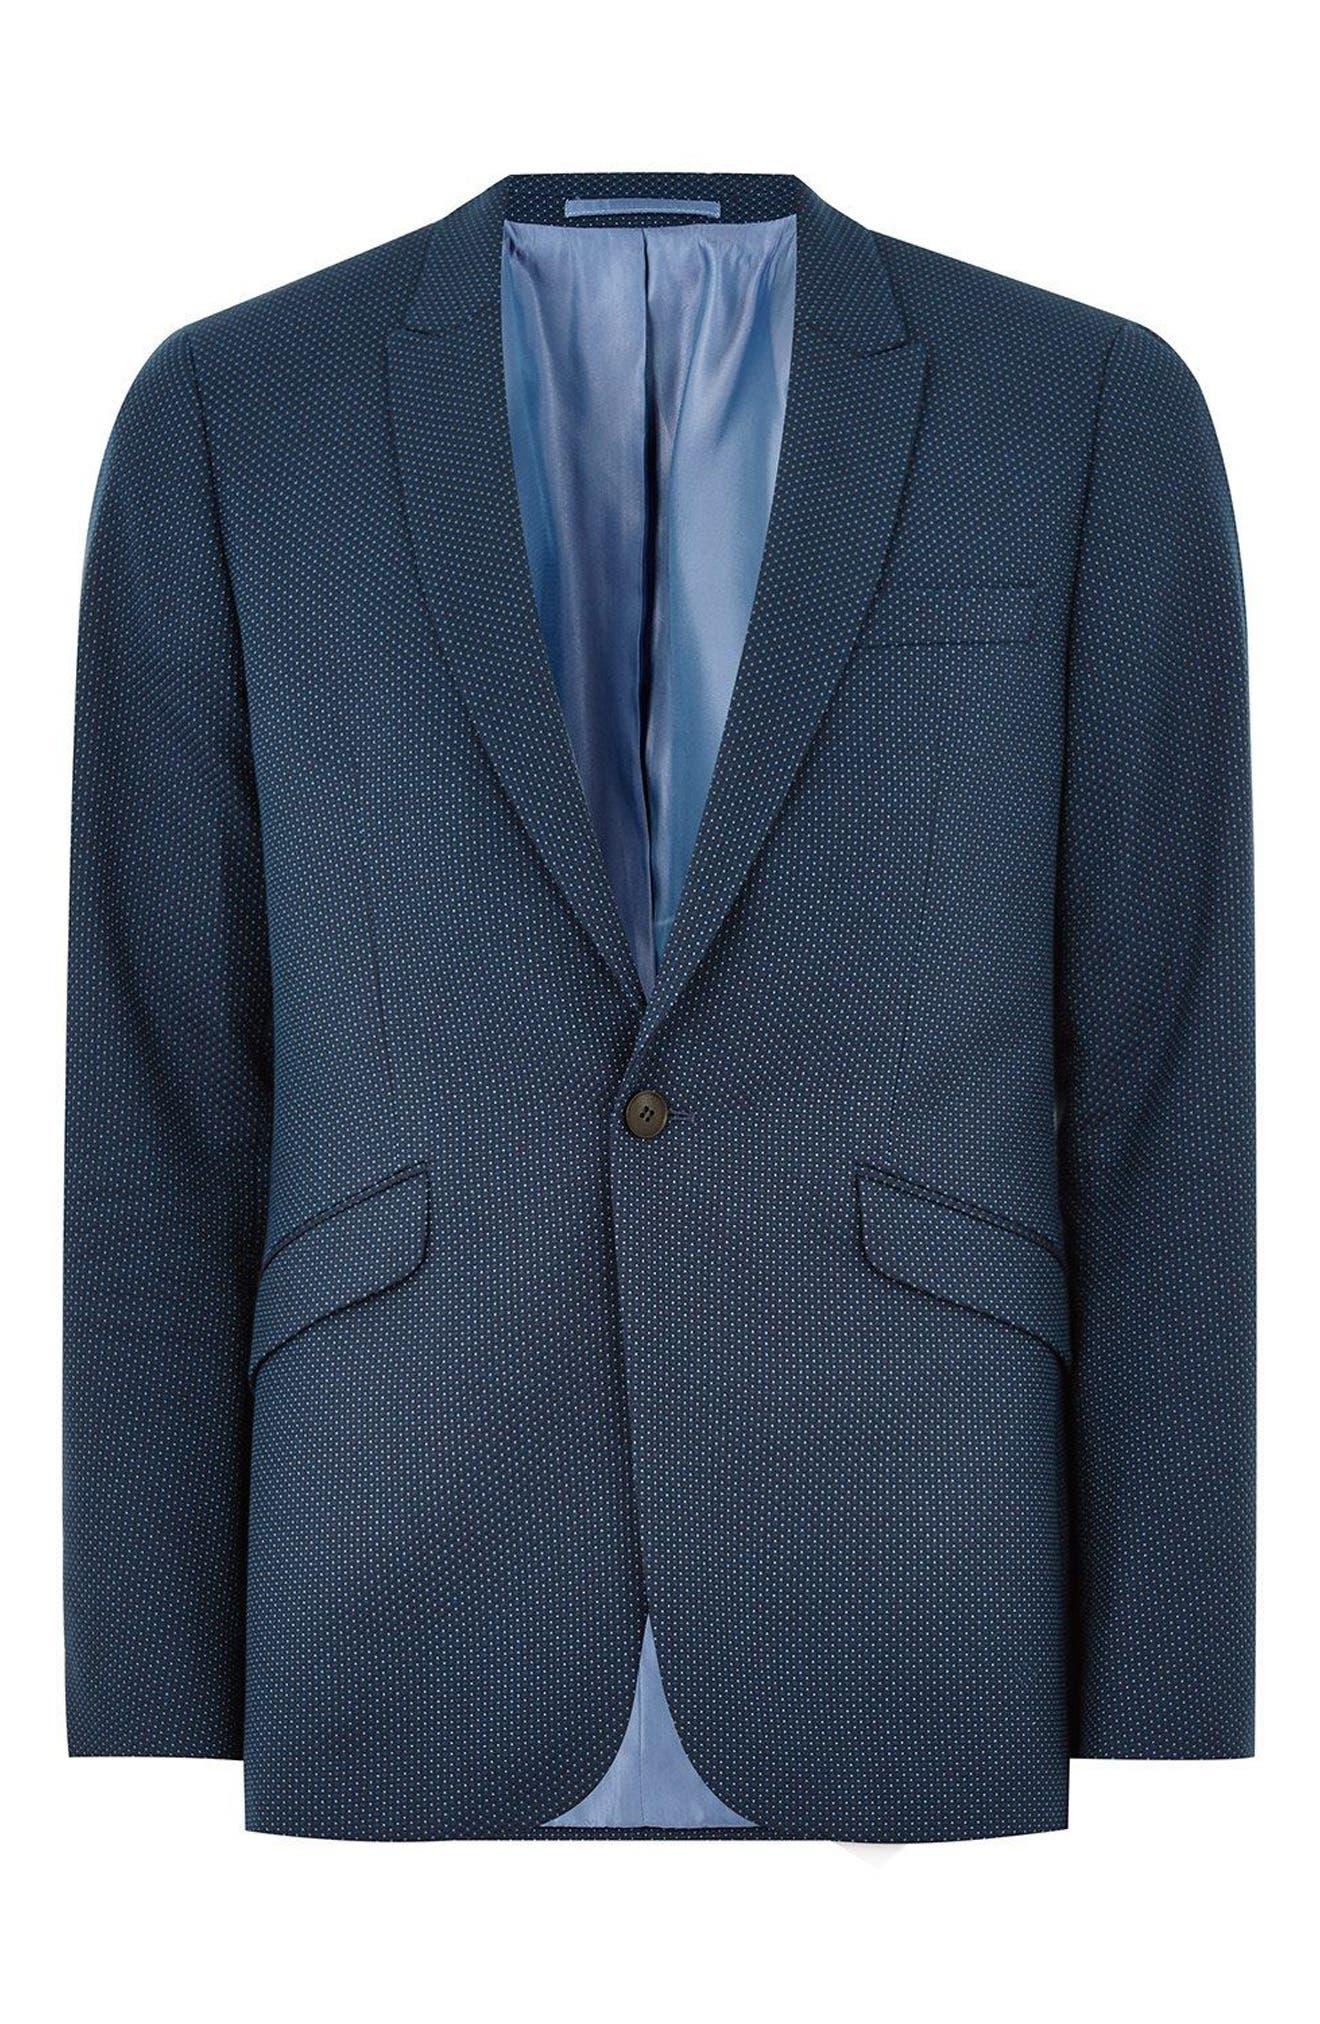 Skinny Fit Pin Dot Suit Jacket,                             Alternate thumbnail 4, color,                             DARK BLUE